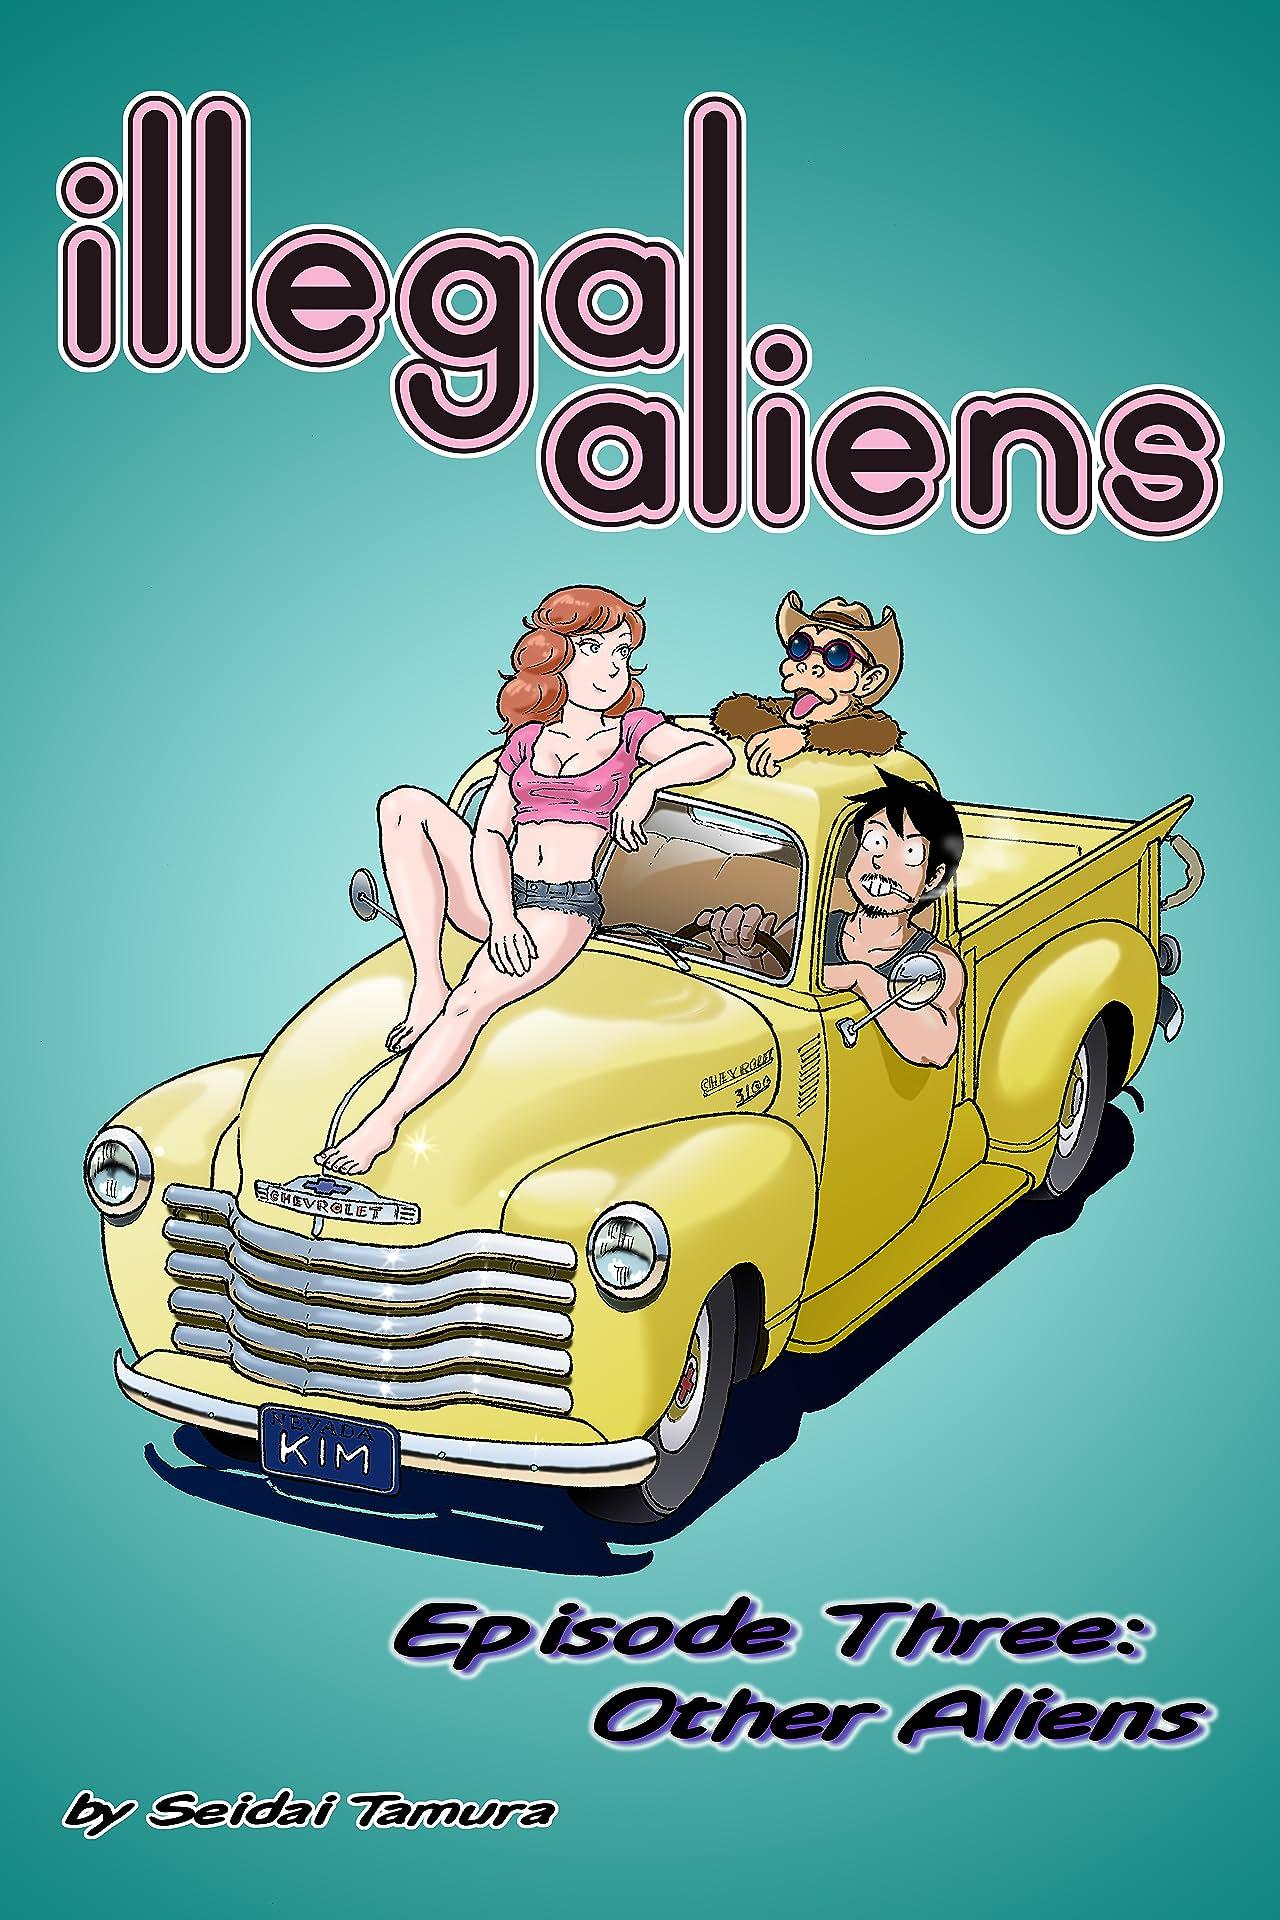 Illegal Aliens #3: Other Aliens